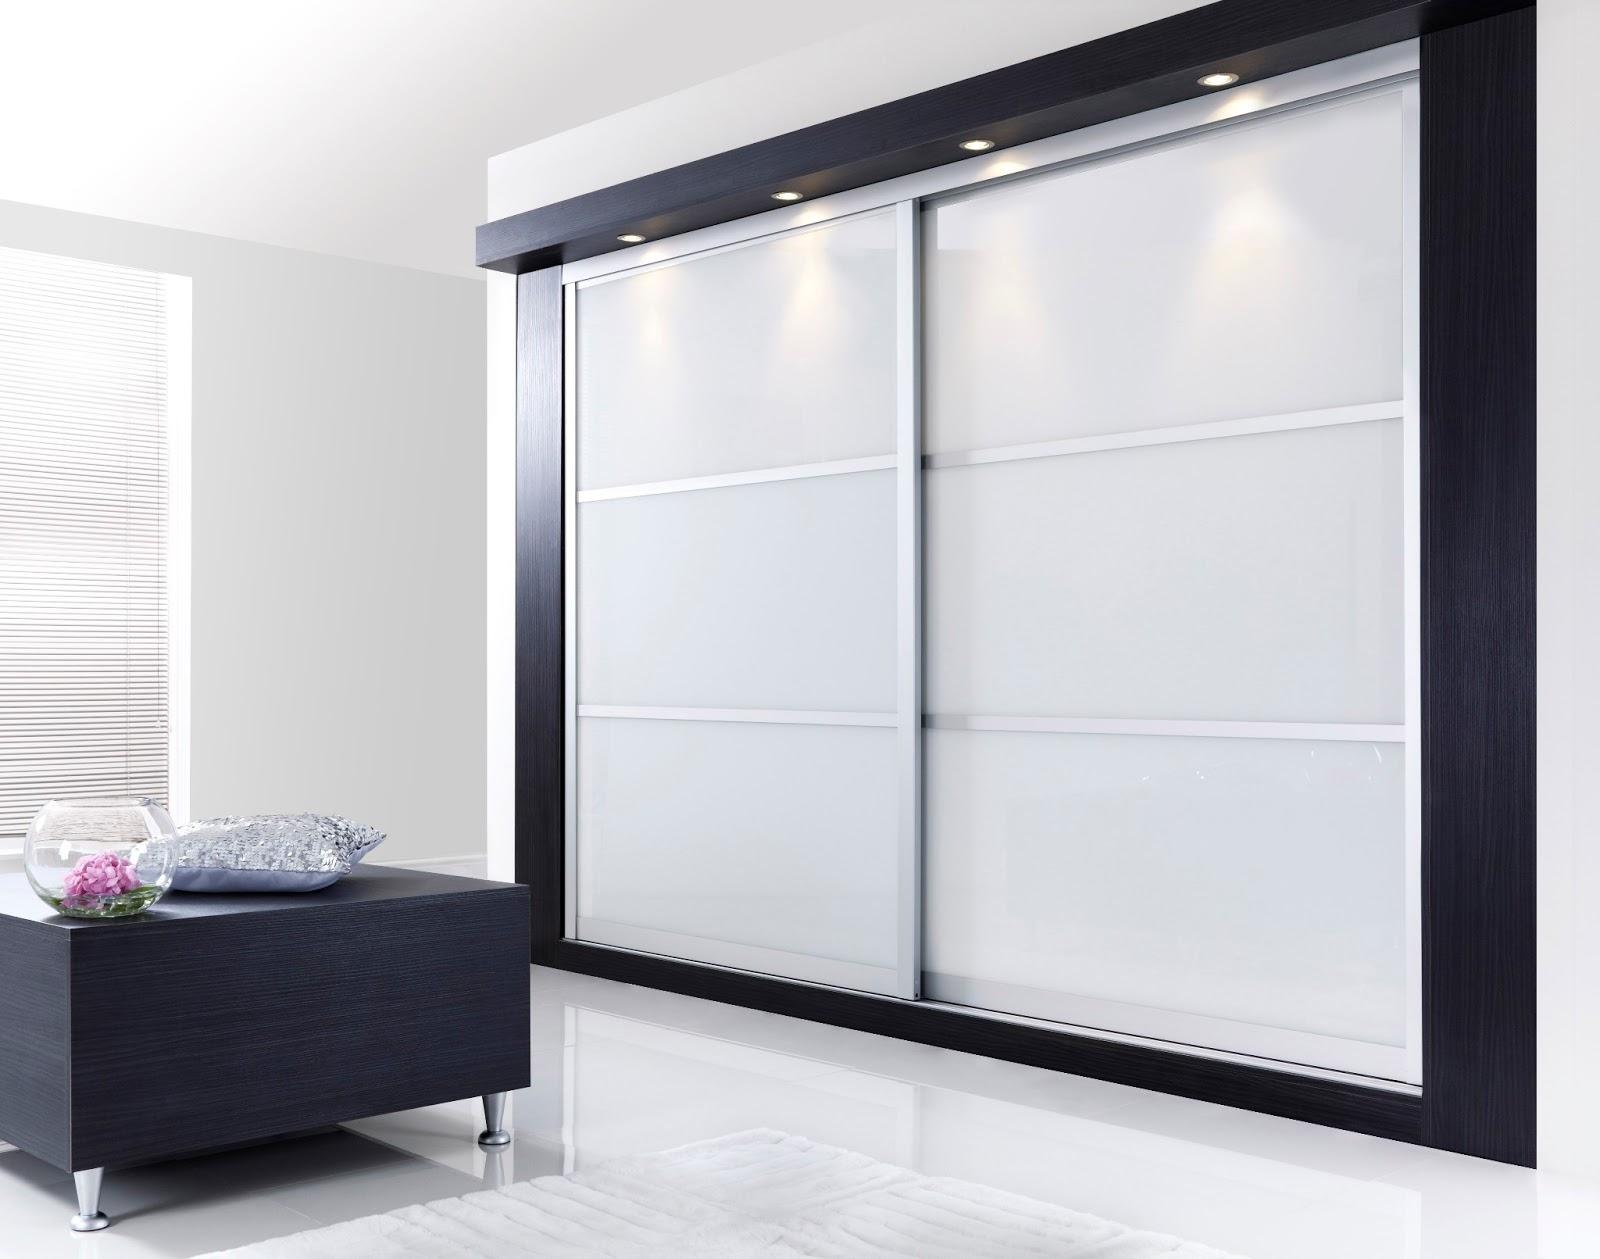 фасады шкафа-купе для спальни фото